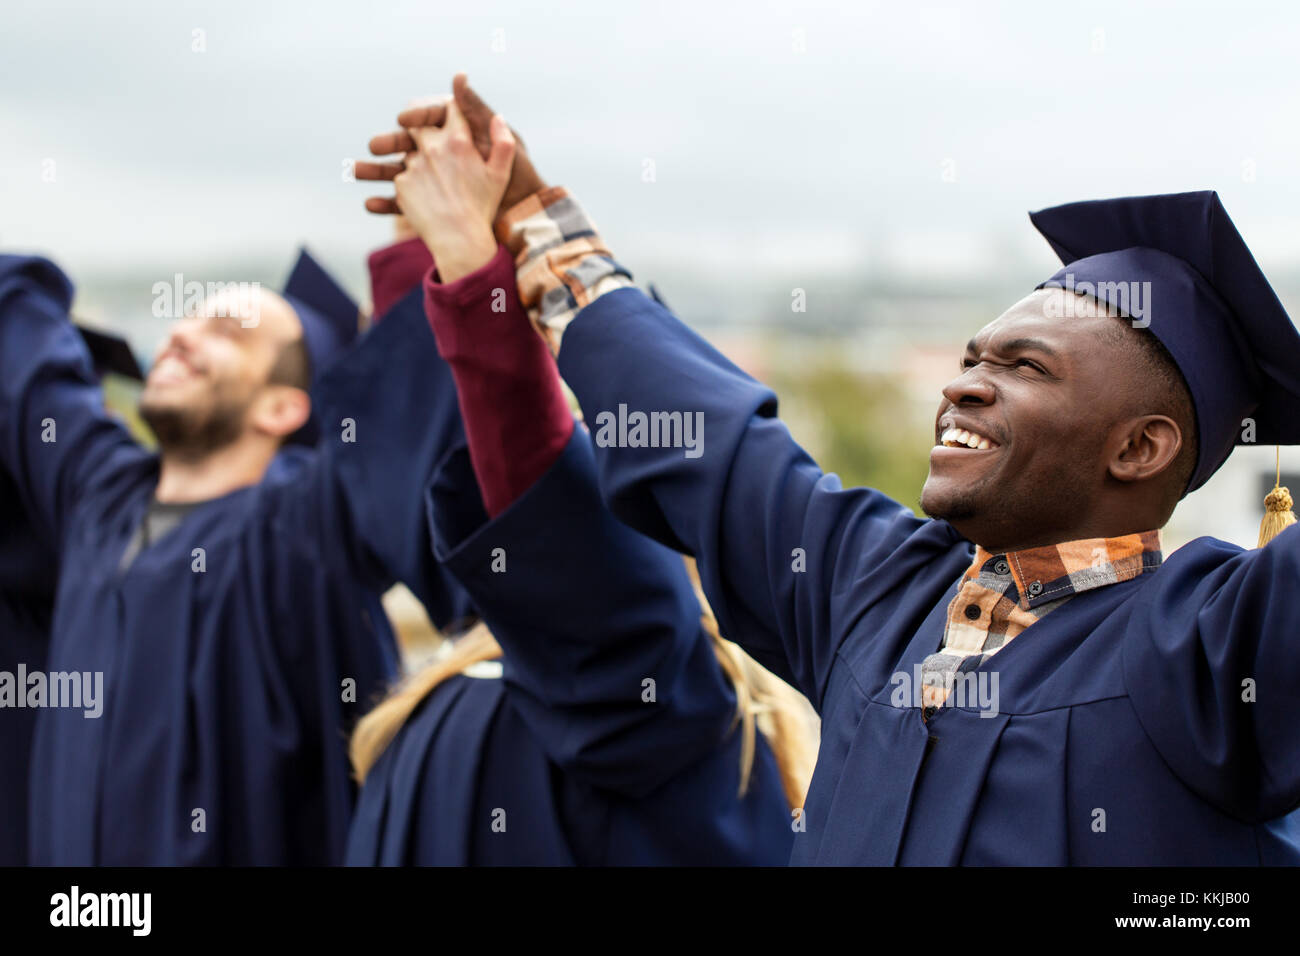 happy students celebrating graduation - Stock Image